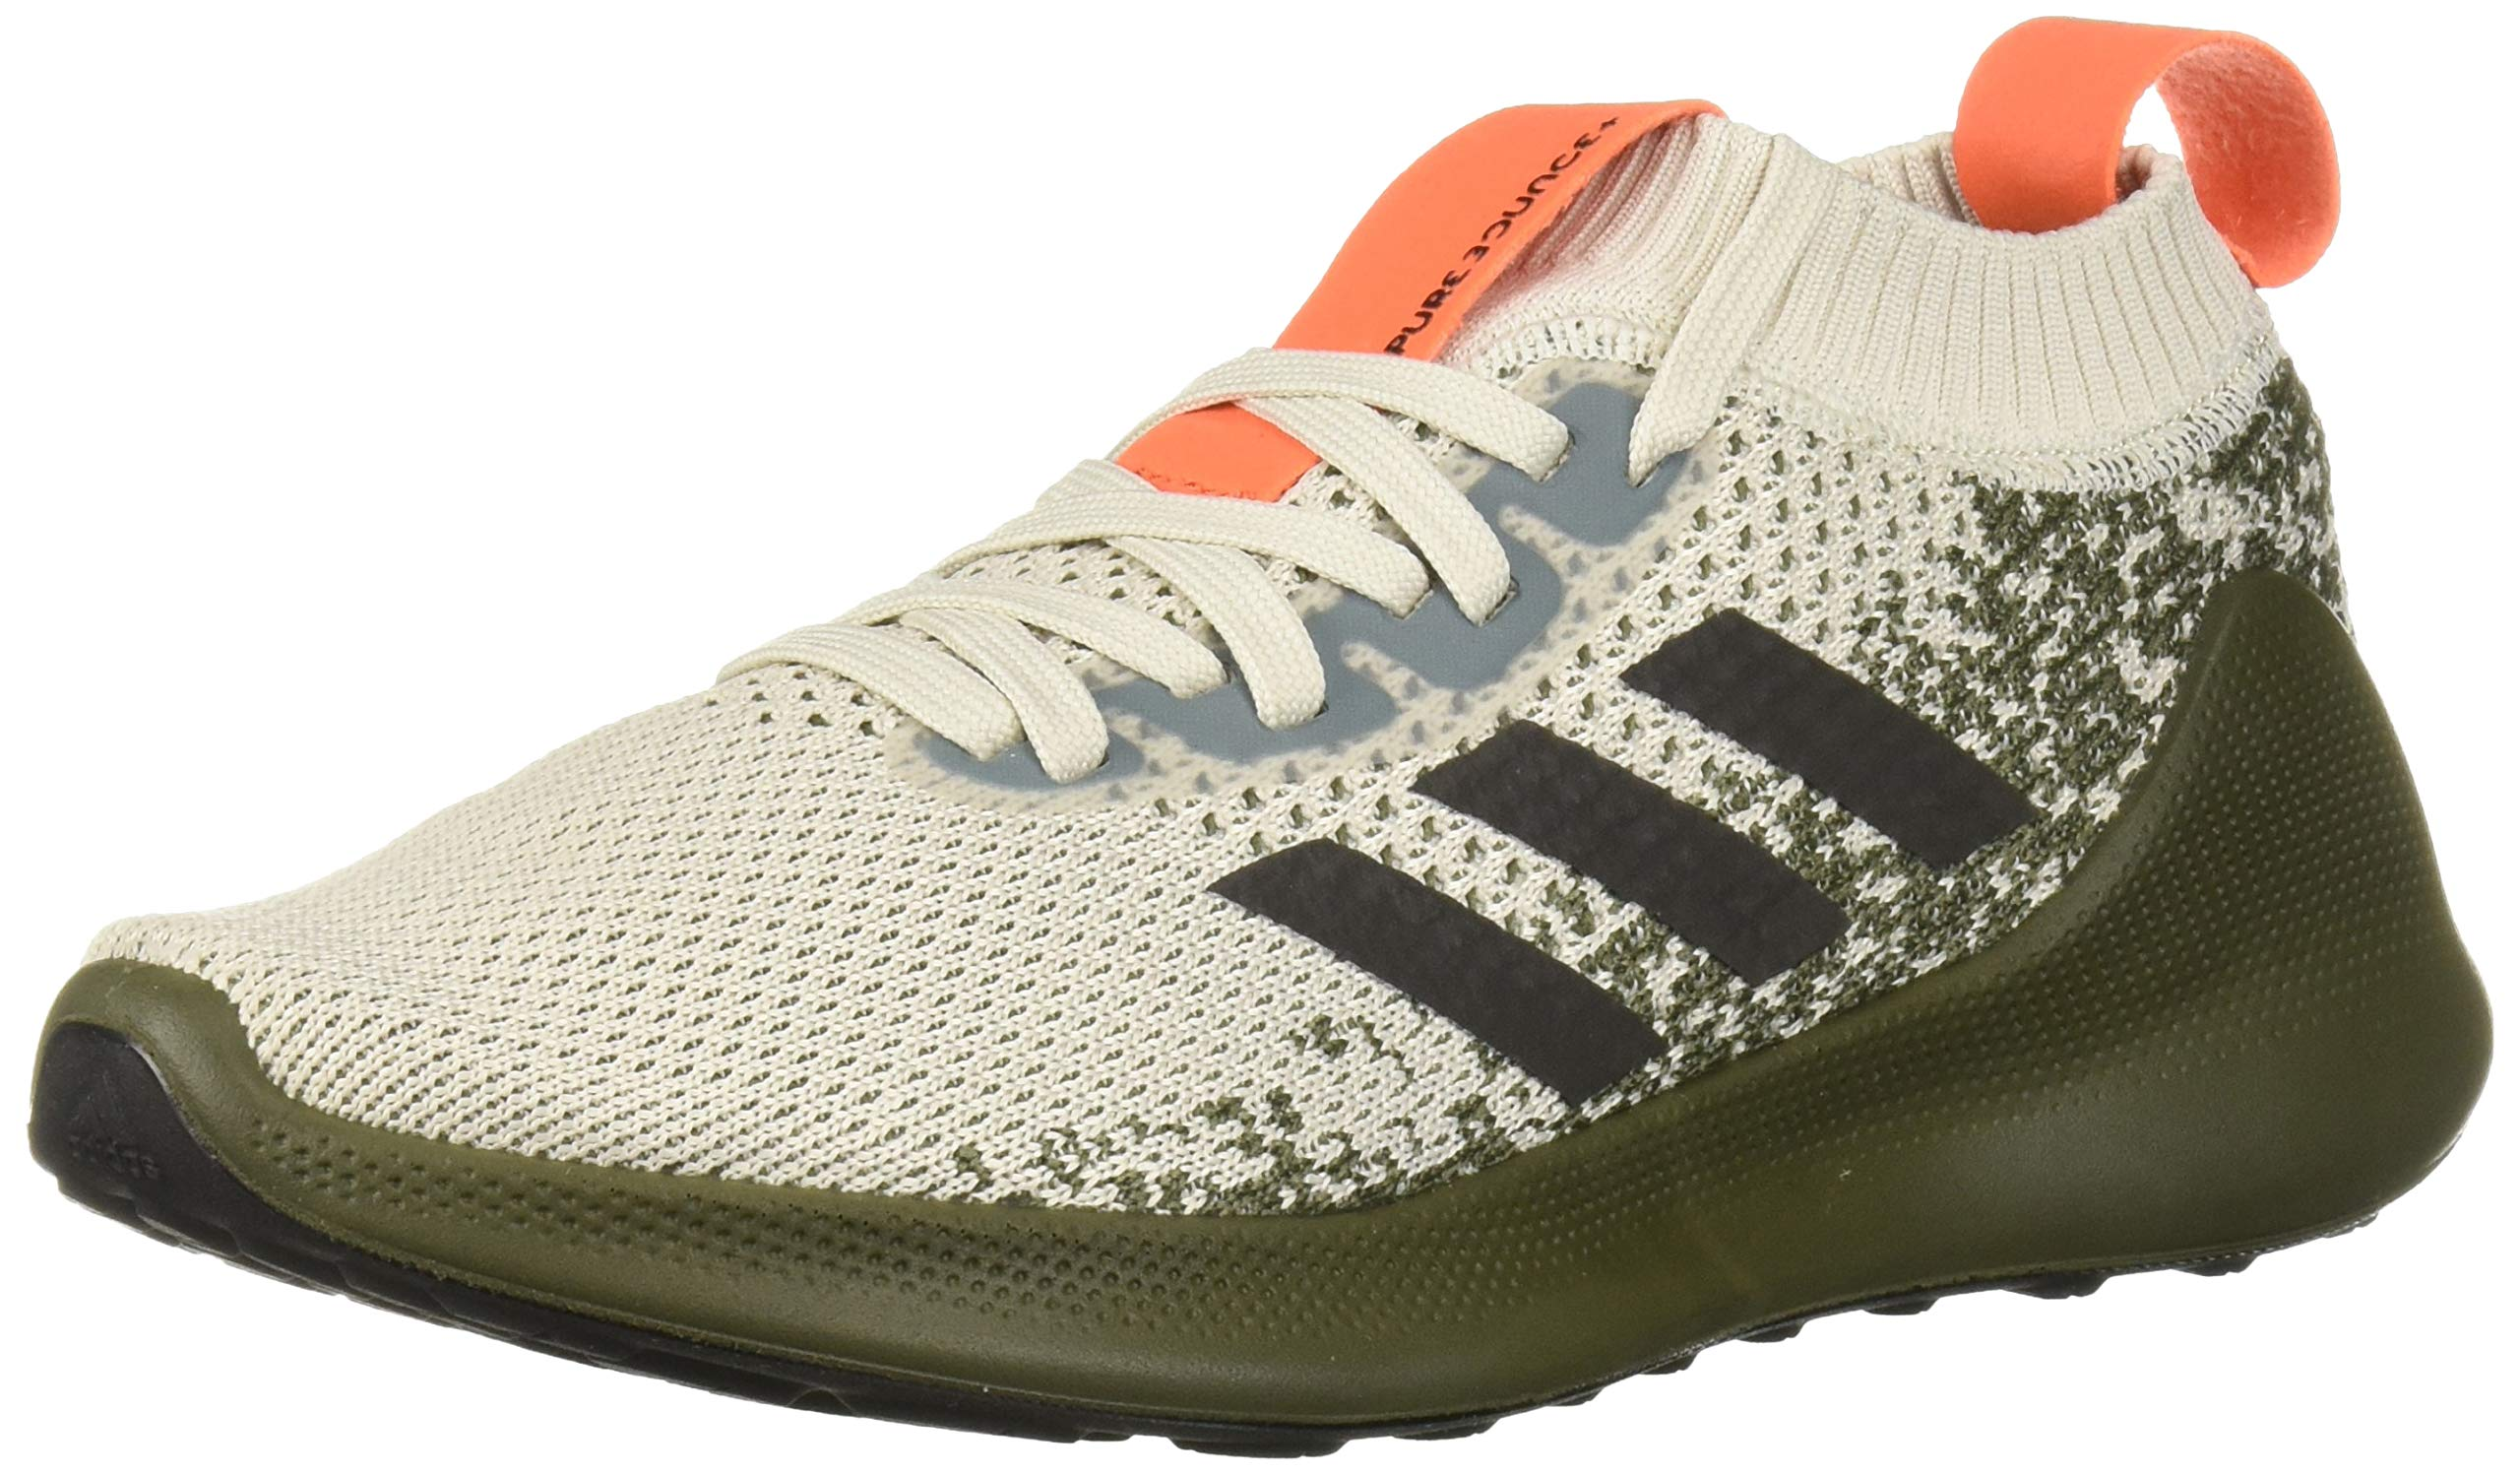 adidas Kids' Purebounce+ Golf Shoe